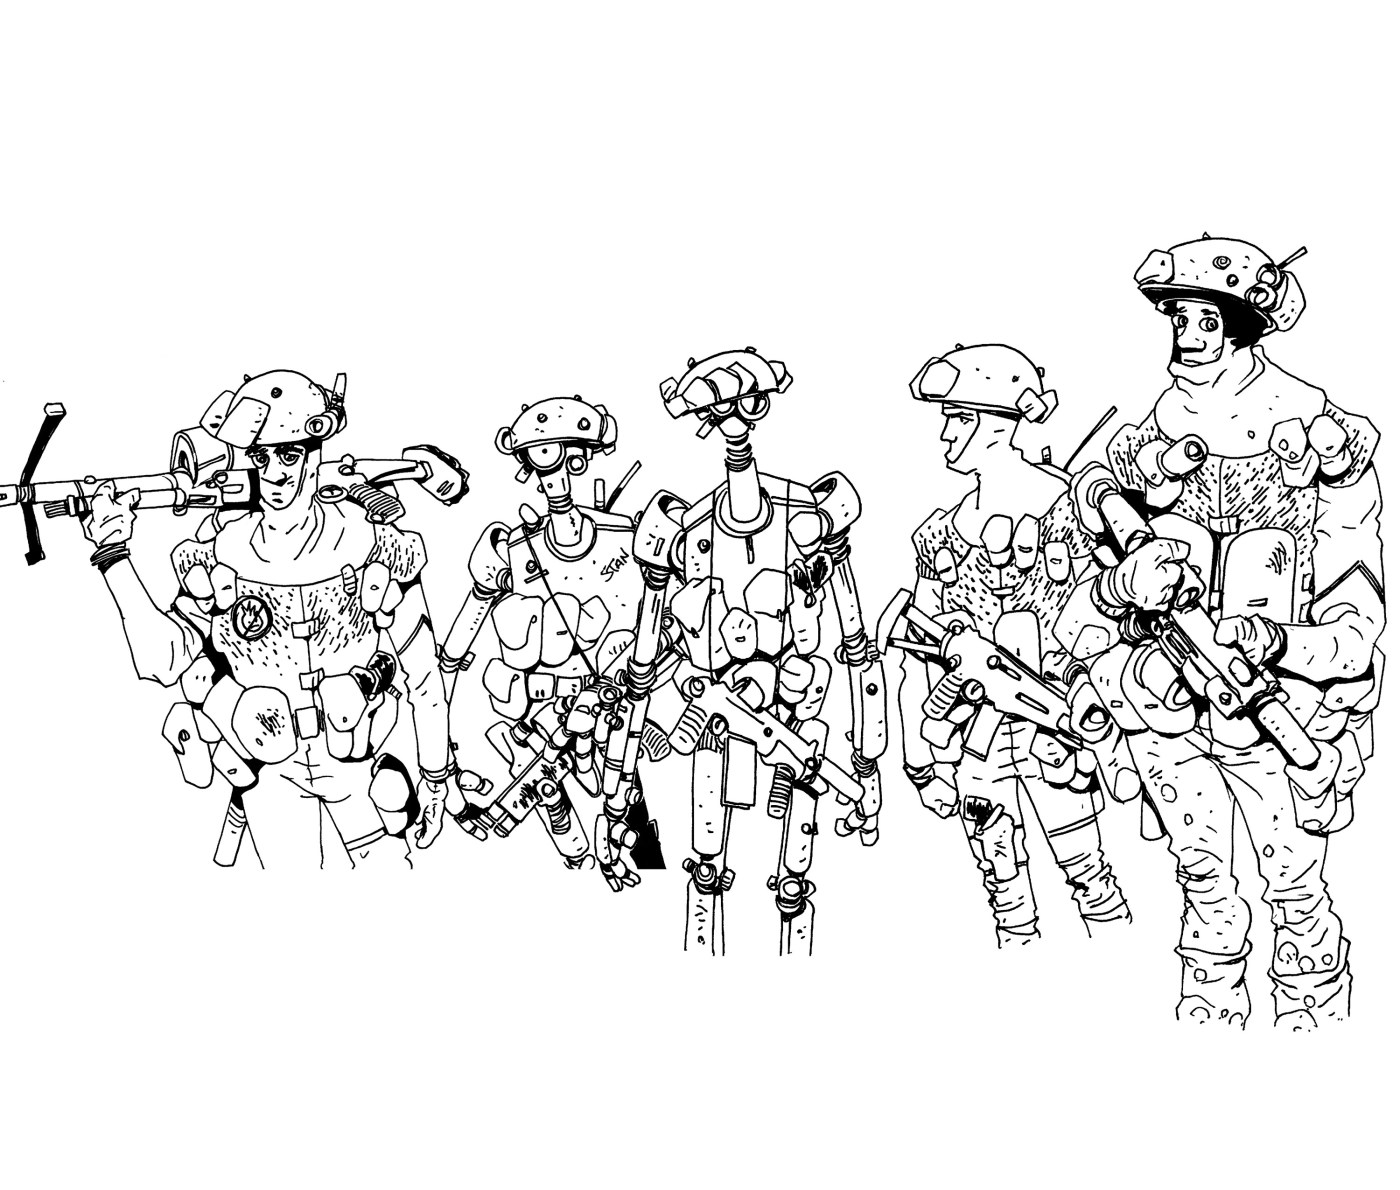 388 and Bots Bonus art